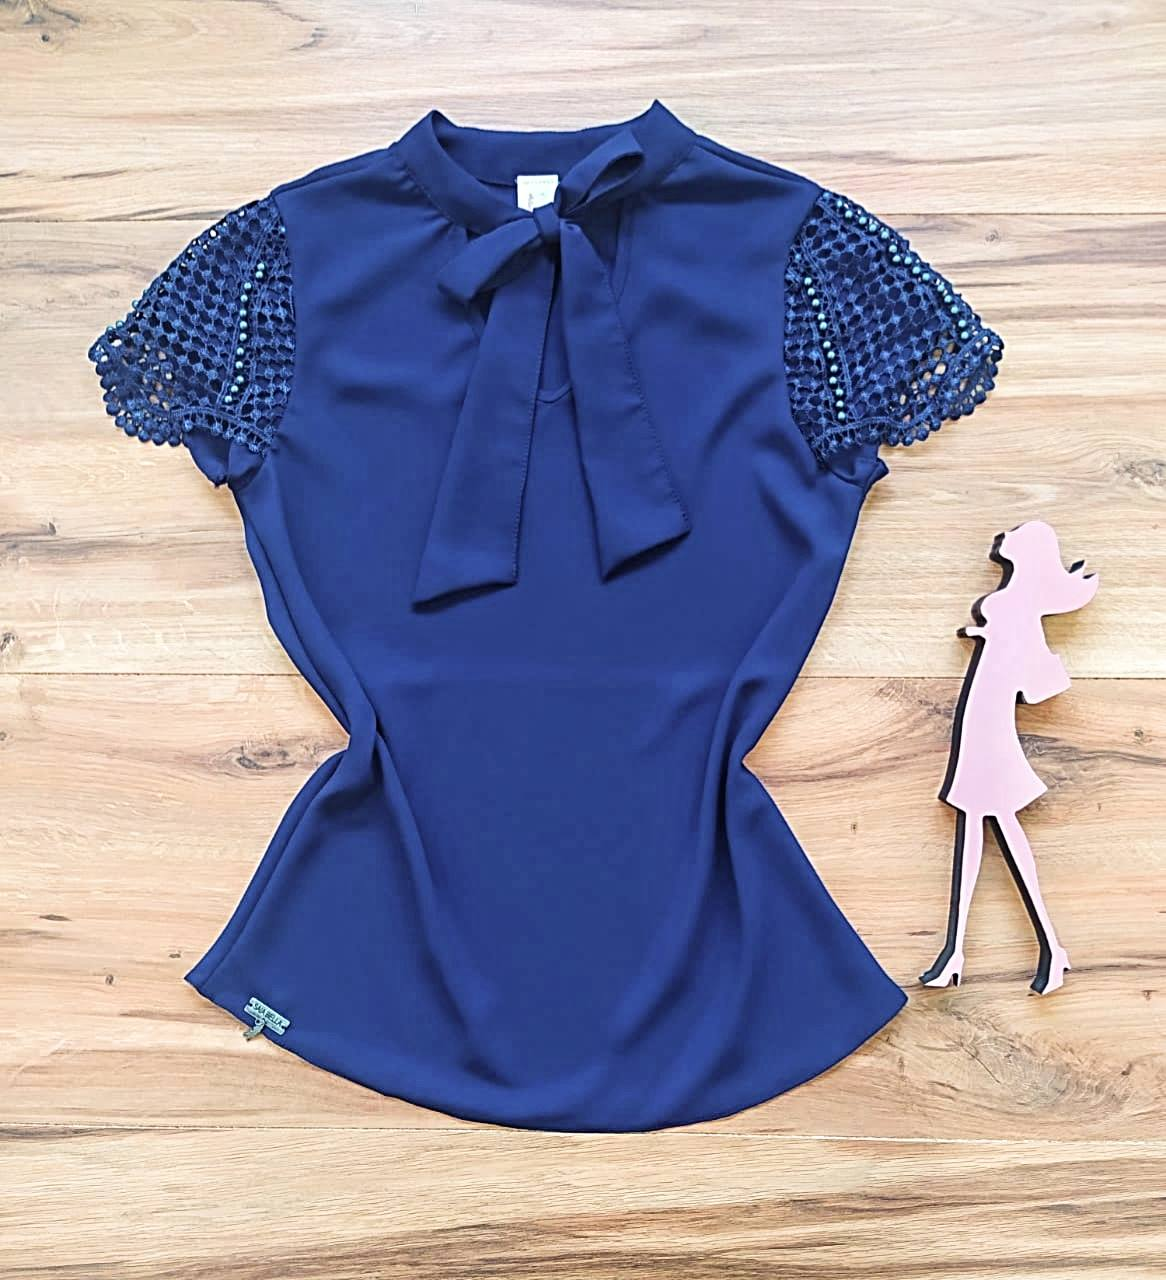 Blusa Heloísa Saia Bella - SBR7780 Azul Marinho